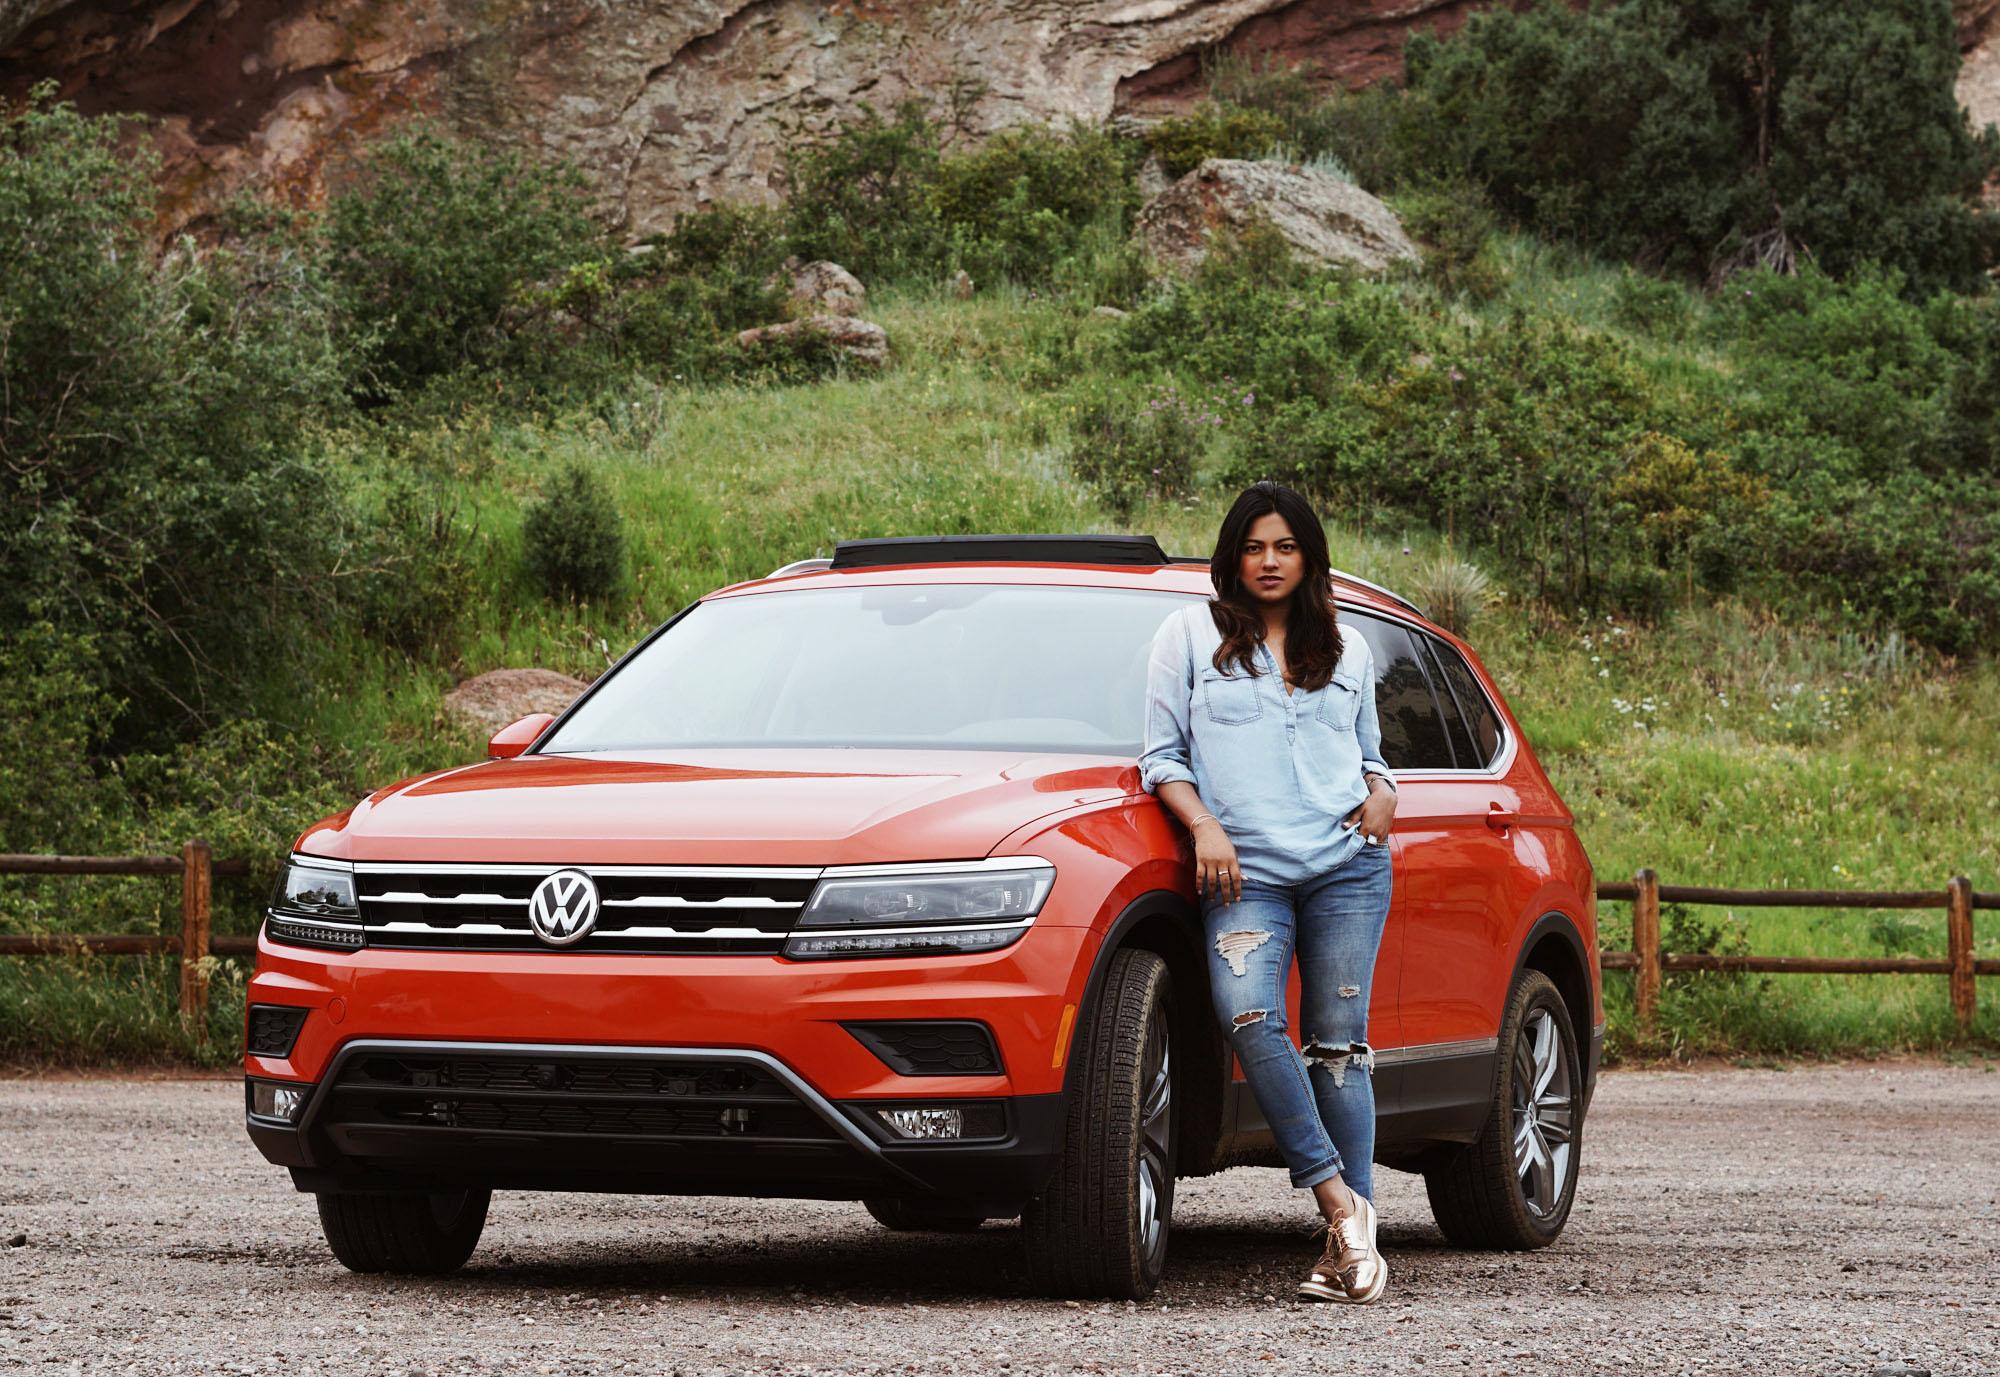 Car Blogger Influencer Chic Stylista Afroza Khan